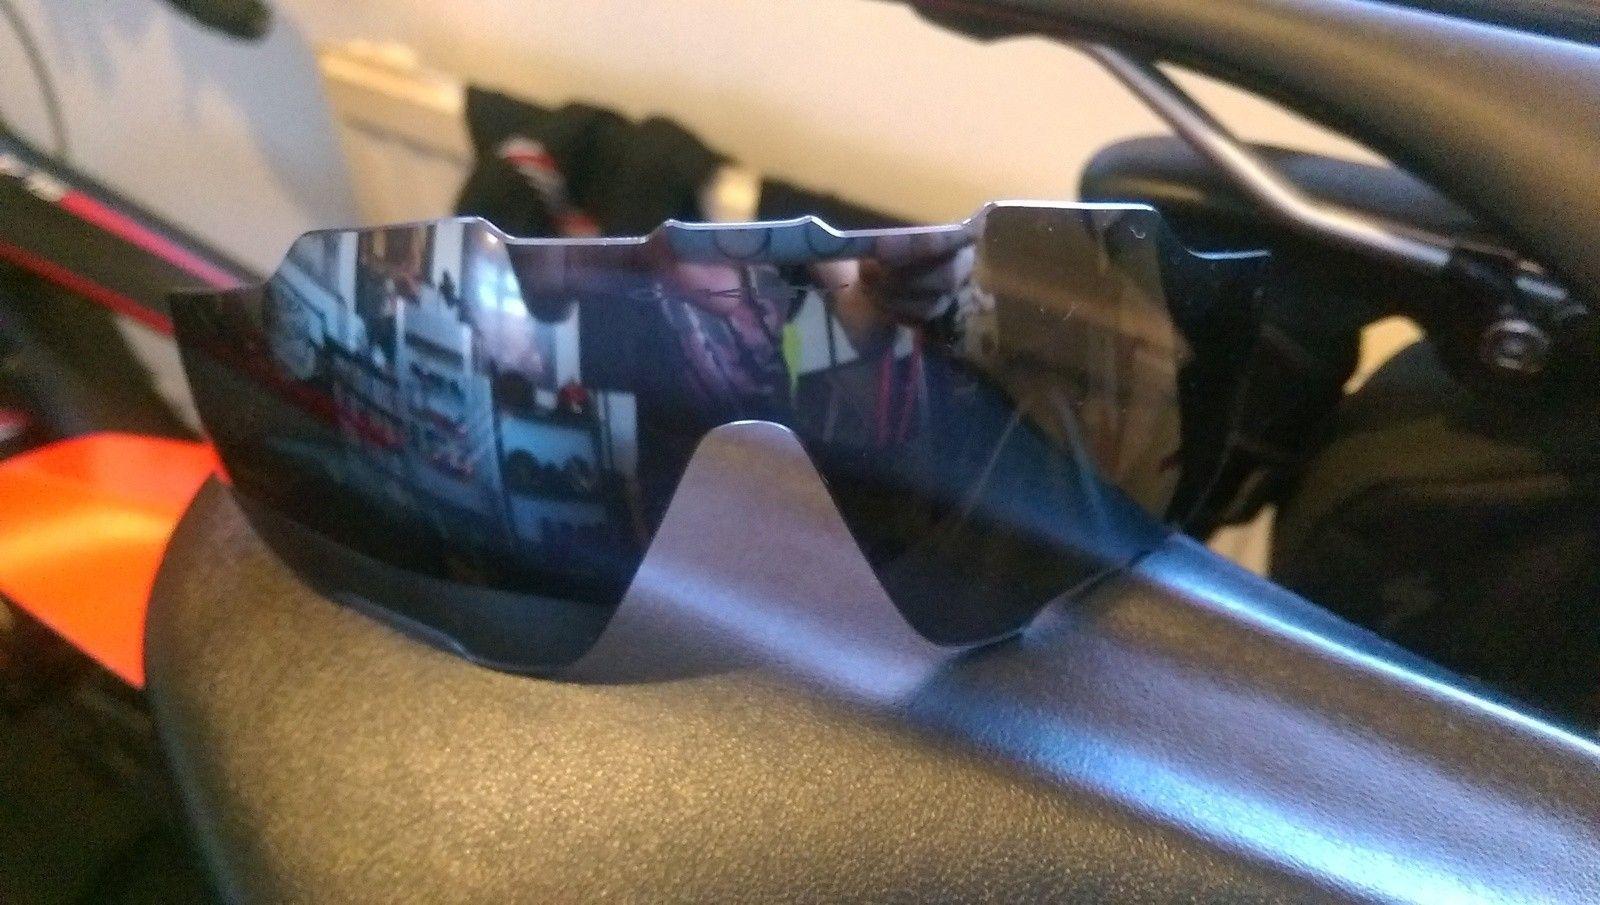 Oakley Jawbreaker Black Iridium Lens  (light scratches) - IMAG2332.jpg